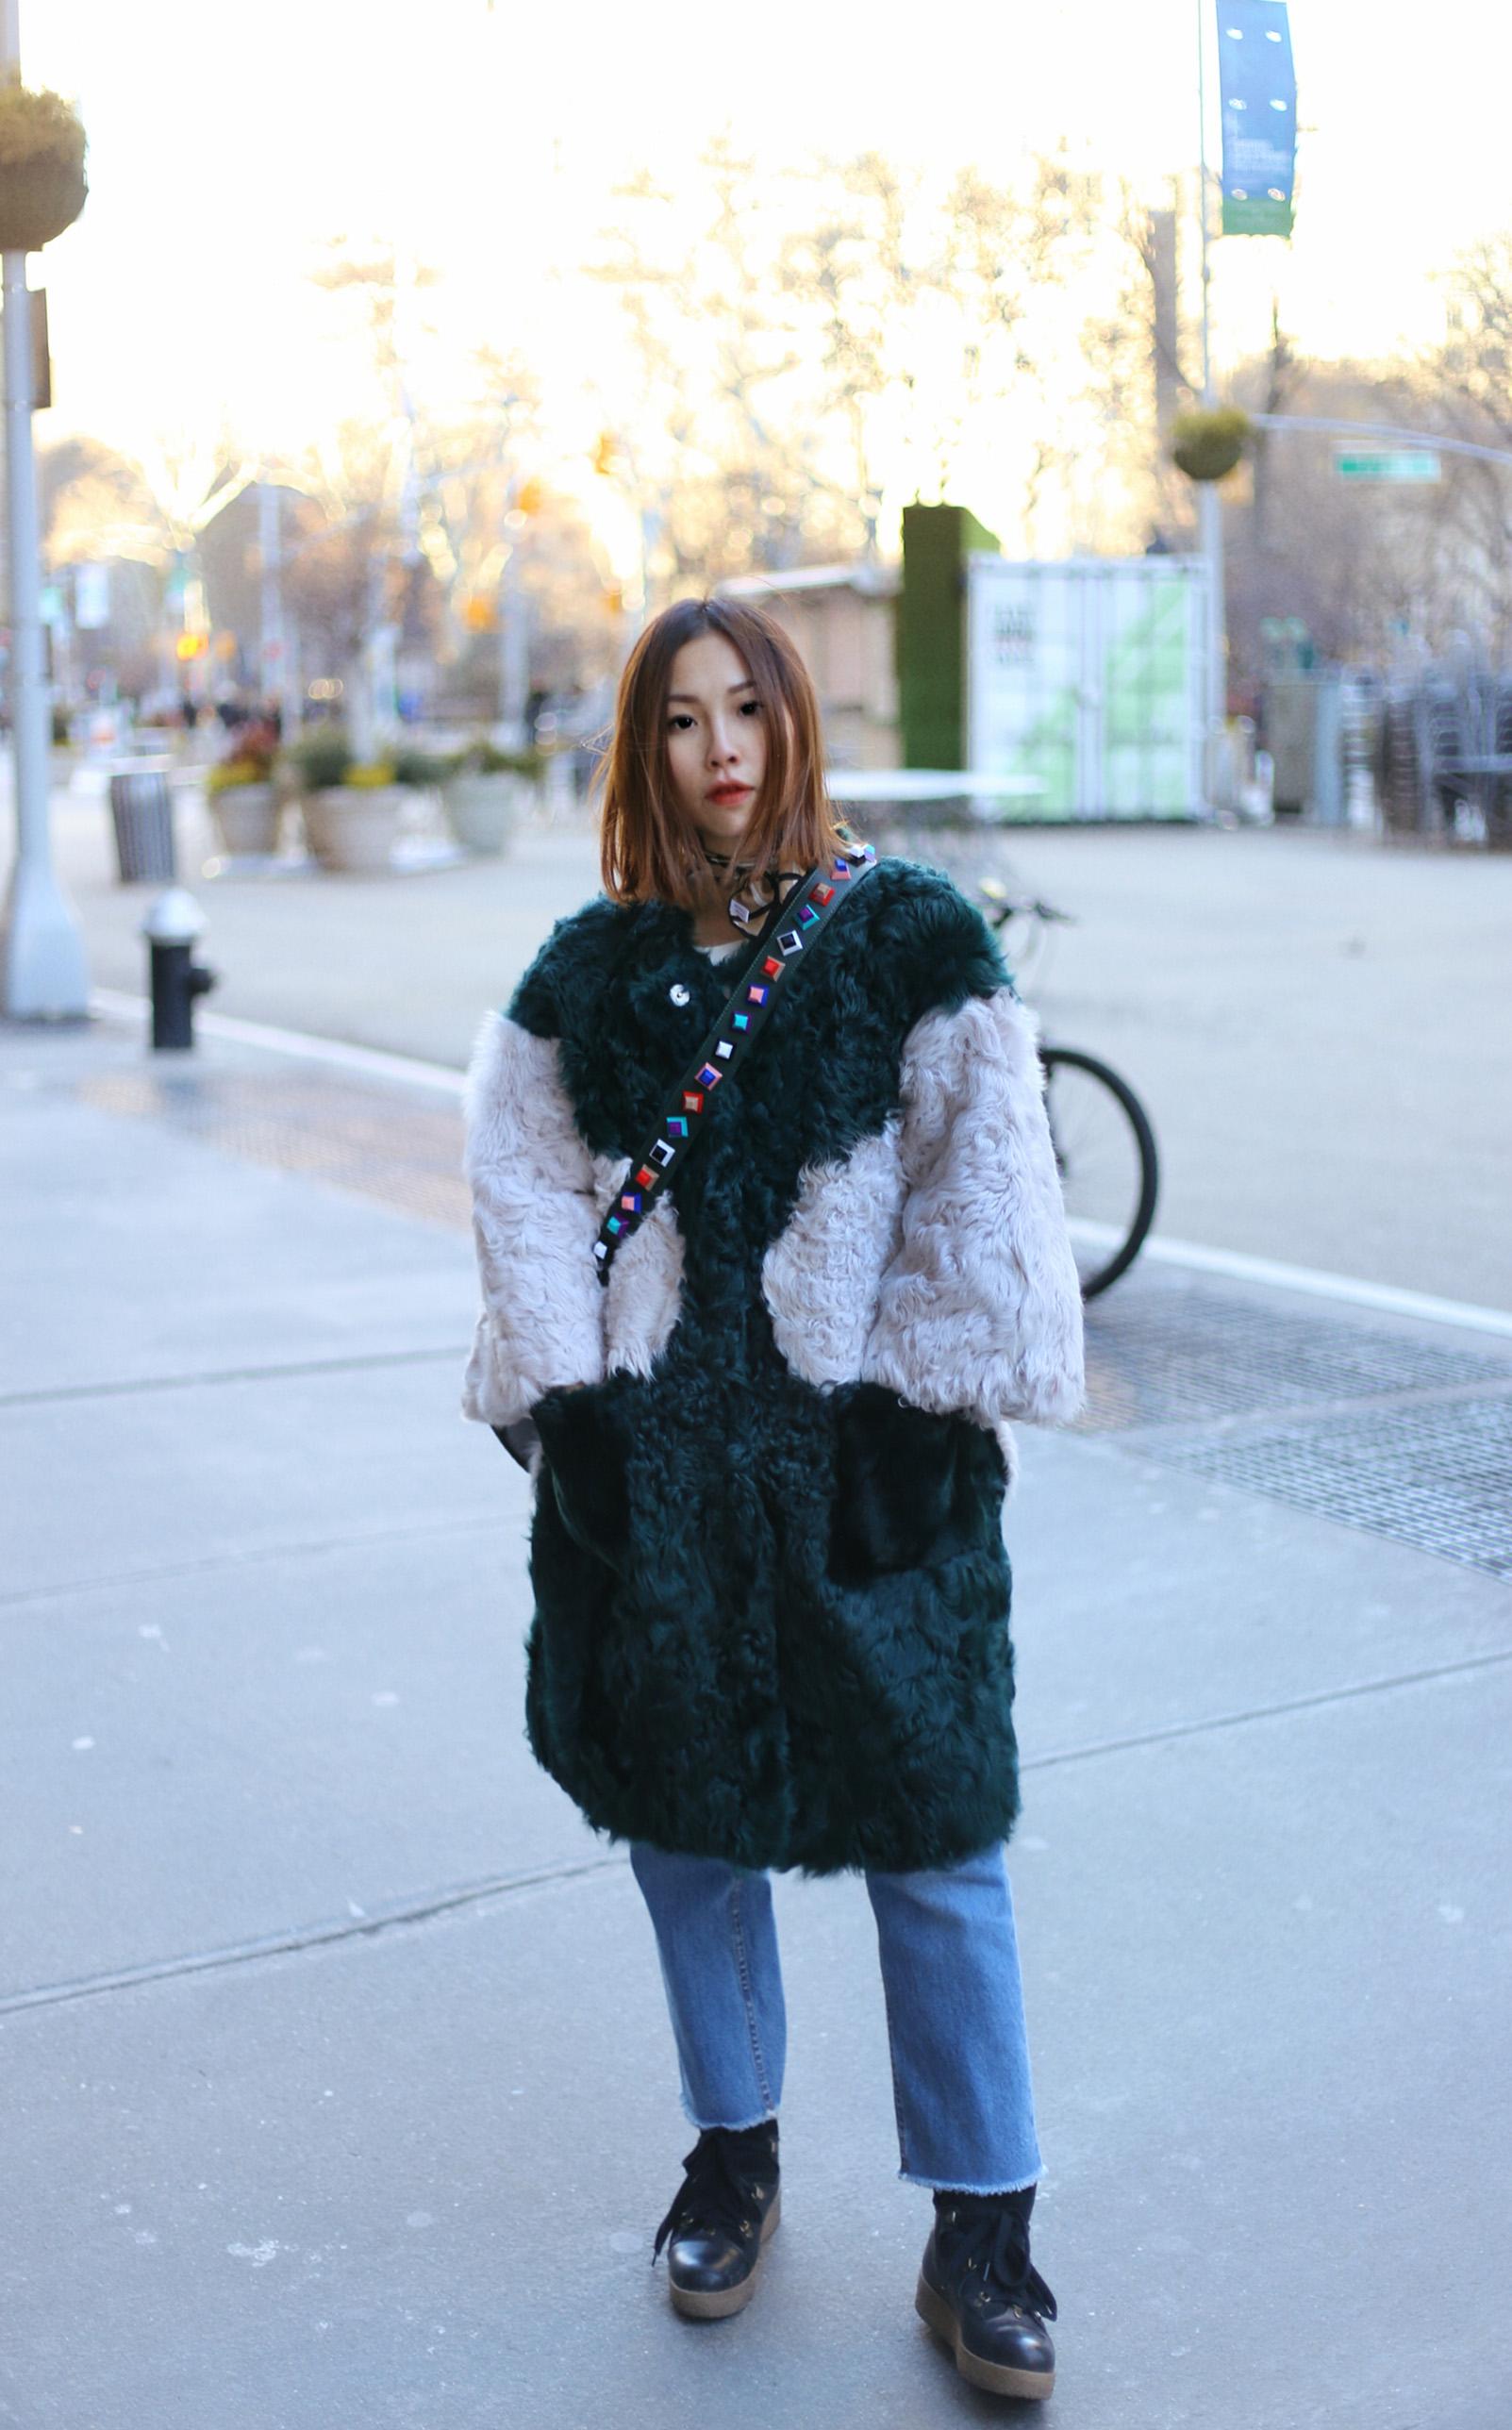 nyc fashion blogger street style.JPG